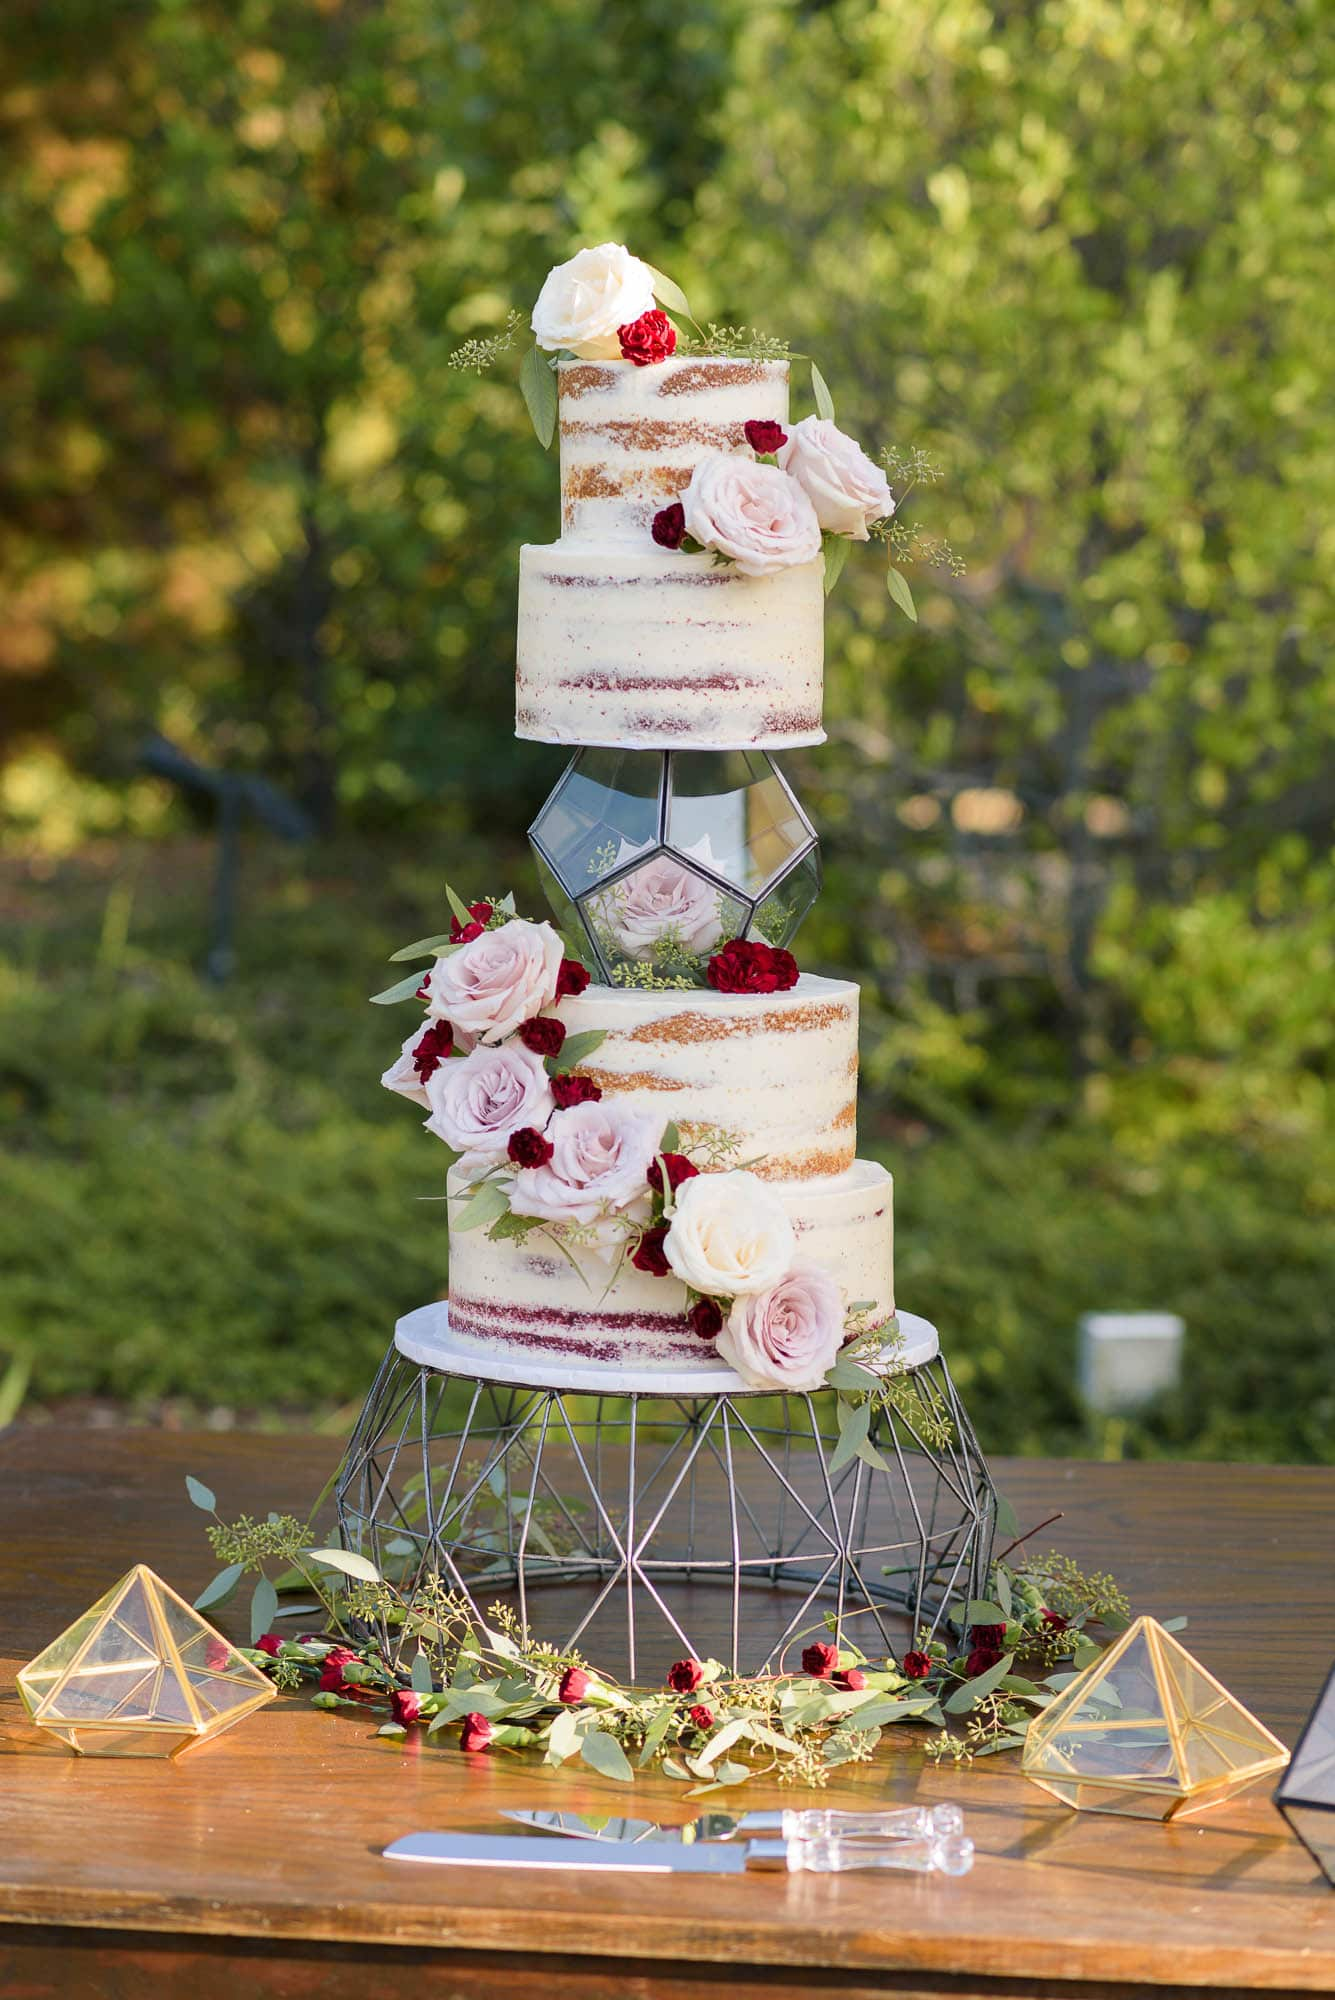 033_Alan_and_Heidi_Wedding_Karla_Paolo